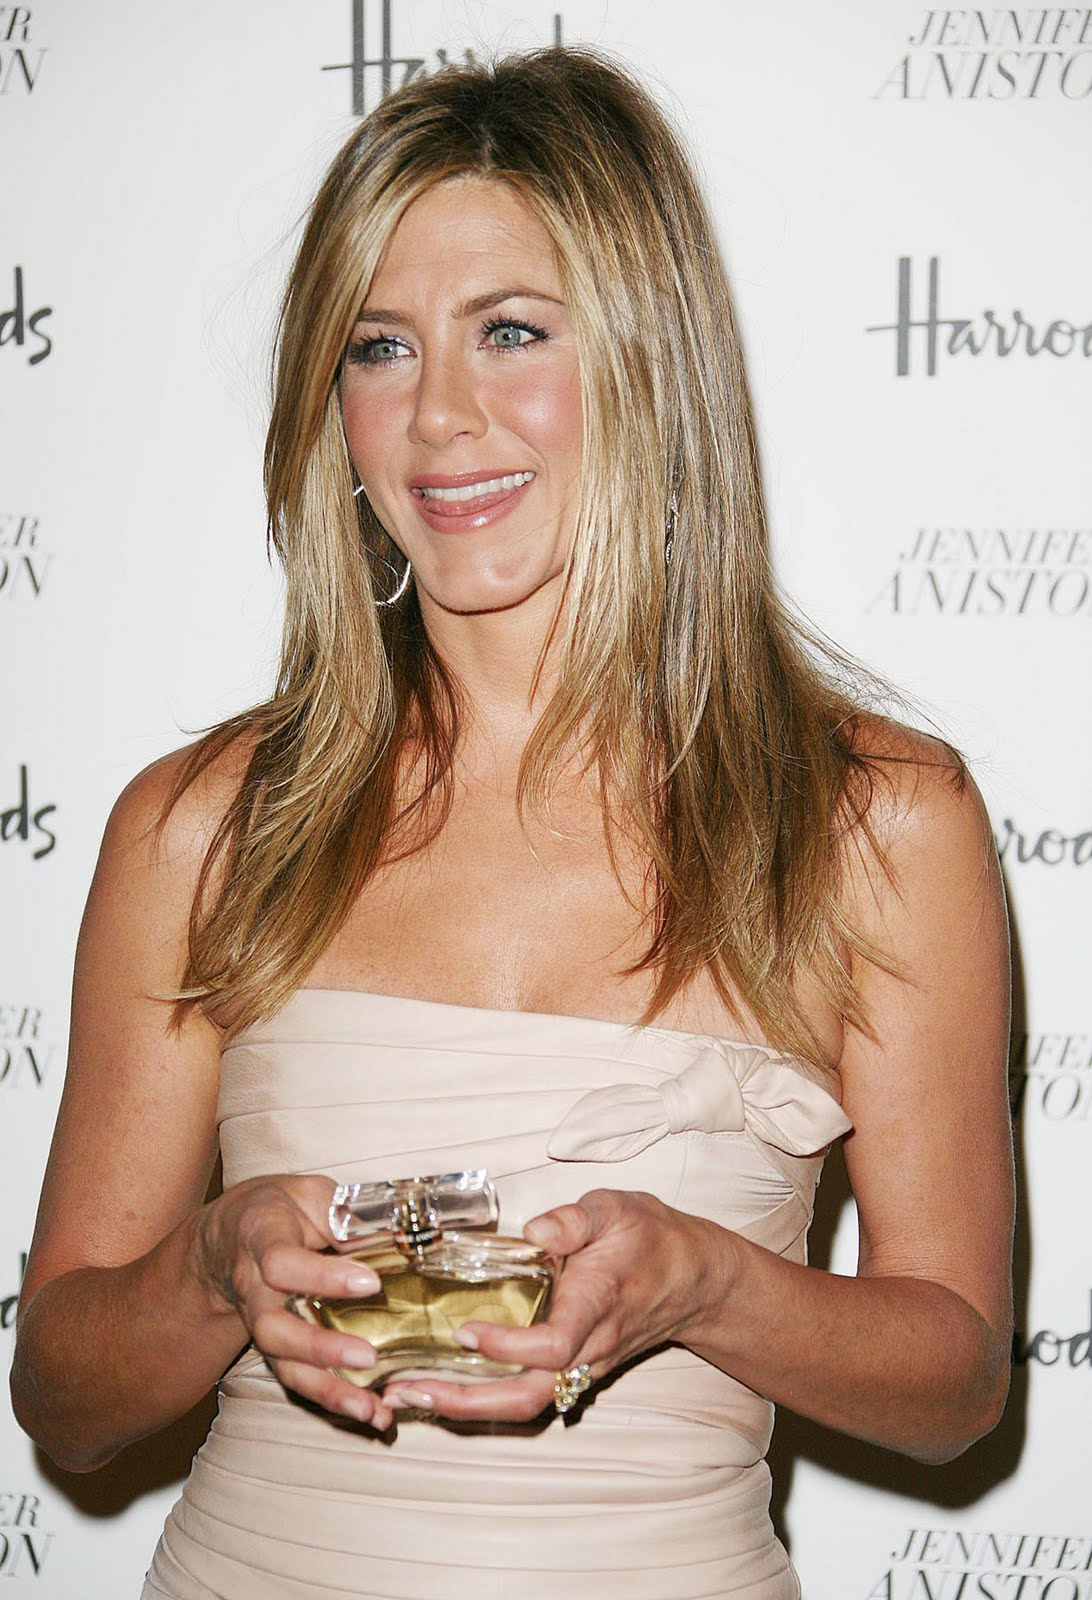 http://1.bp.blogspot.com/-W9aeGz11jwI/TeykFjEvUII/AAAAAAAAAPk/-FHLUQUYqUA/s1600/Jennifer+Aniston+%25281%2529.jpg